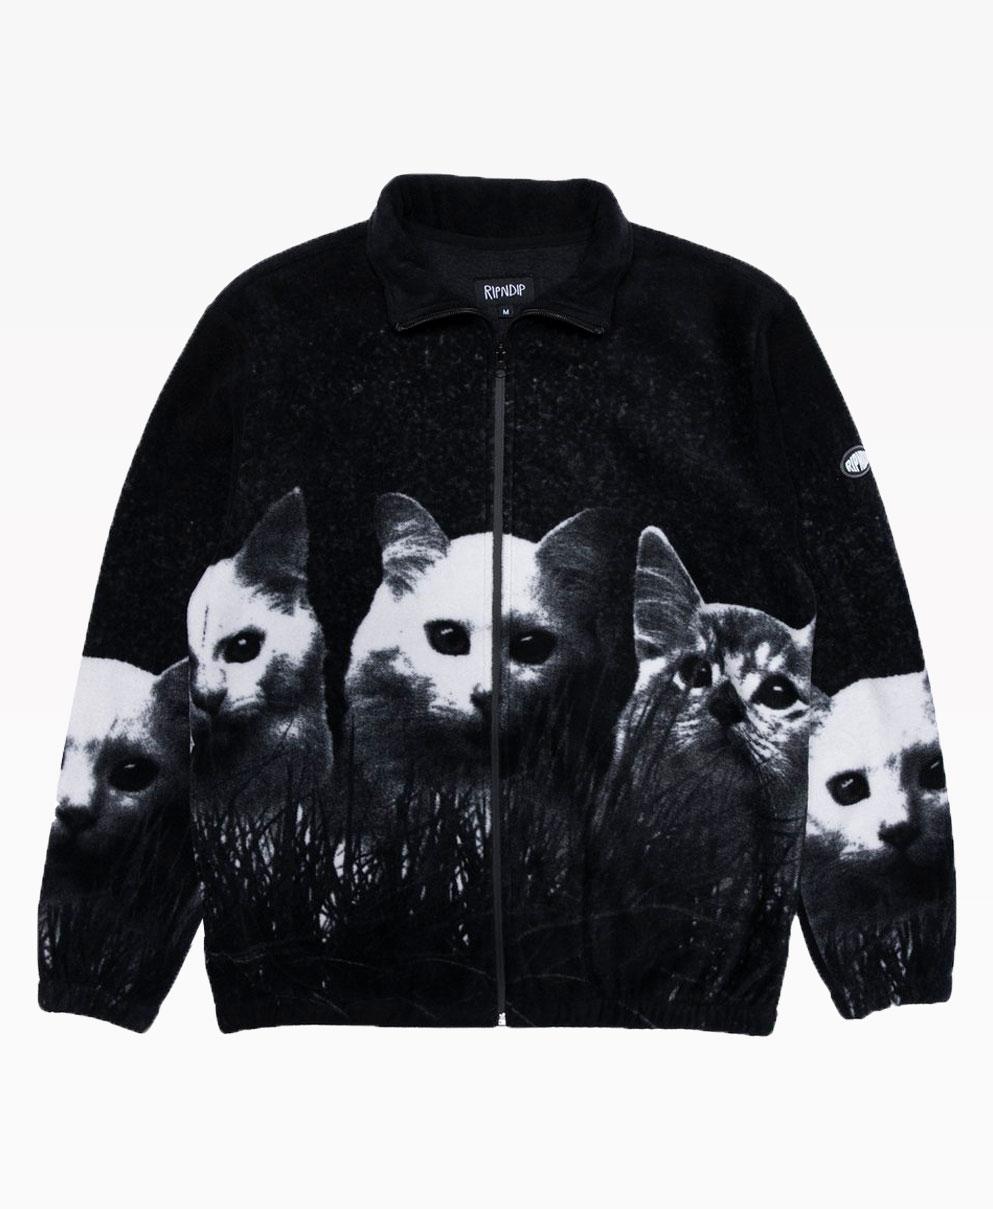 Ripndip Field Of Cats Sherpa Jacket Black Front